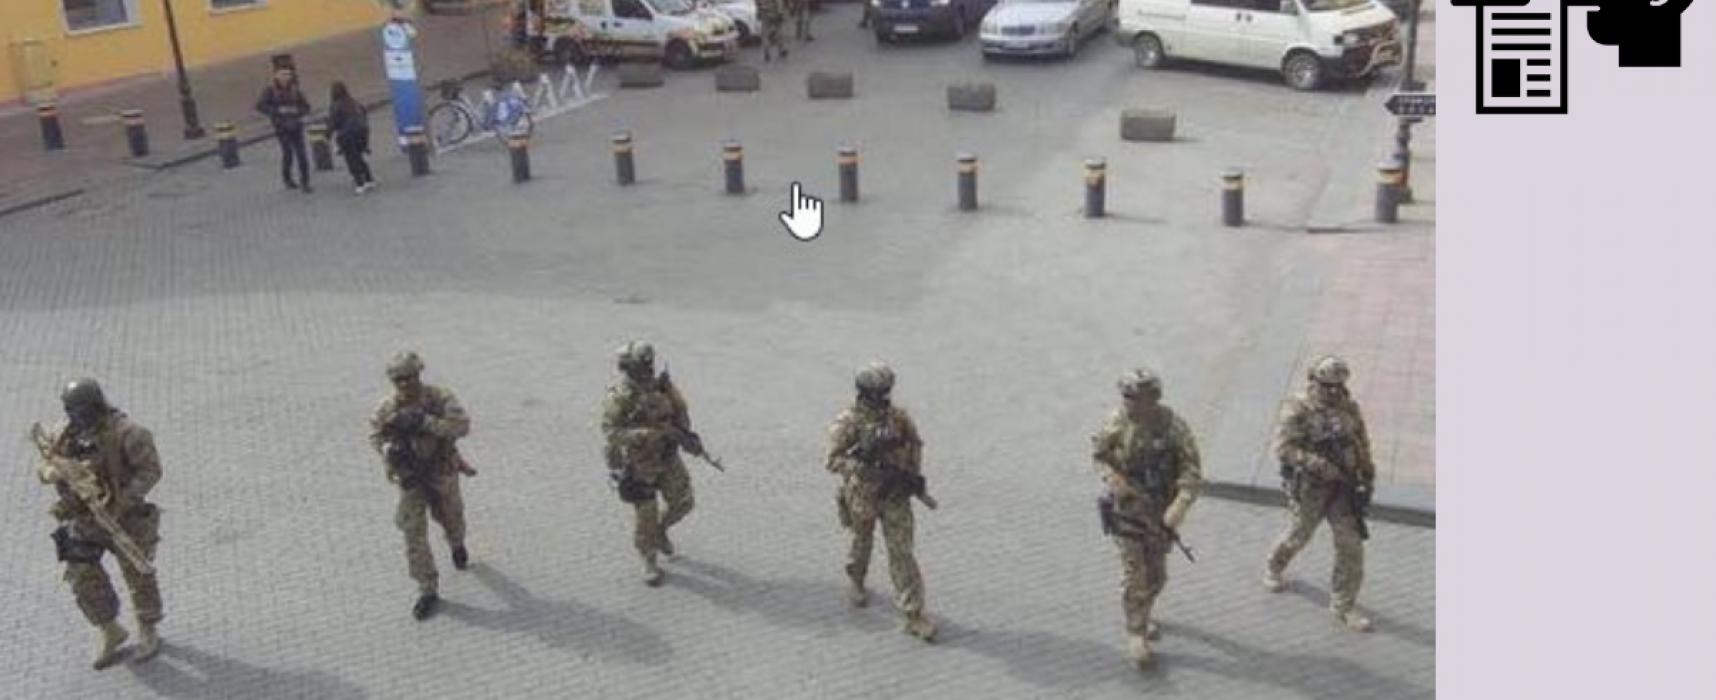 Fake: Ukrainians Voting at Gunpoint